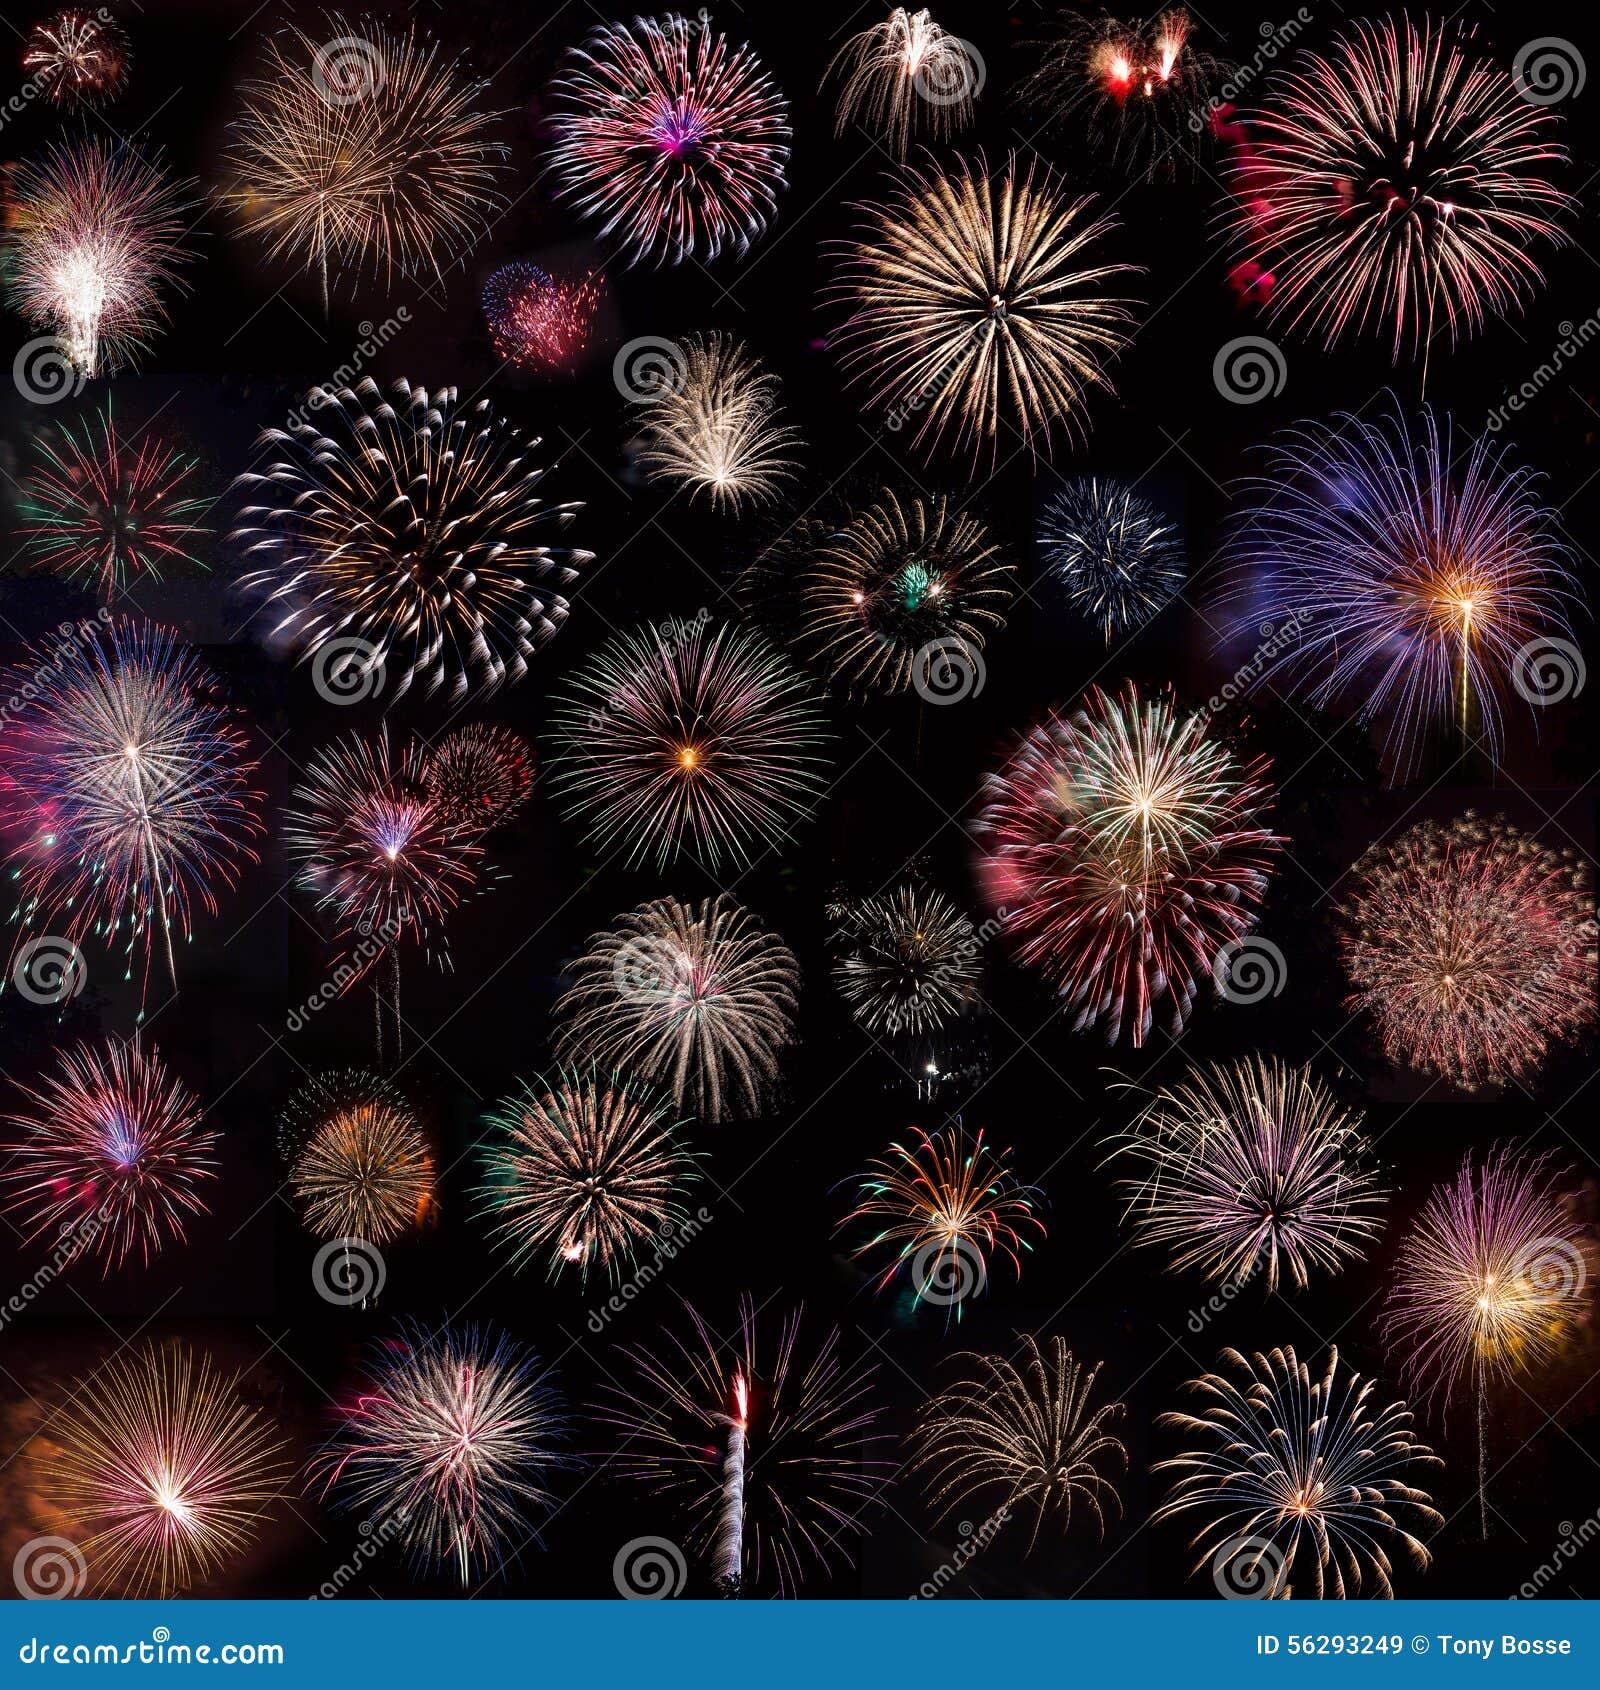 Fireworks Collage